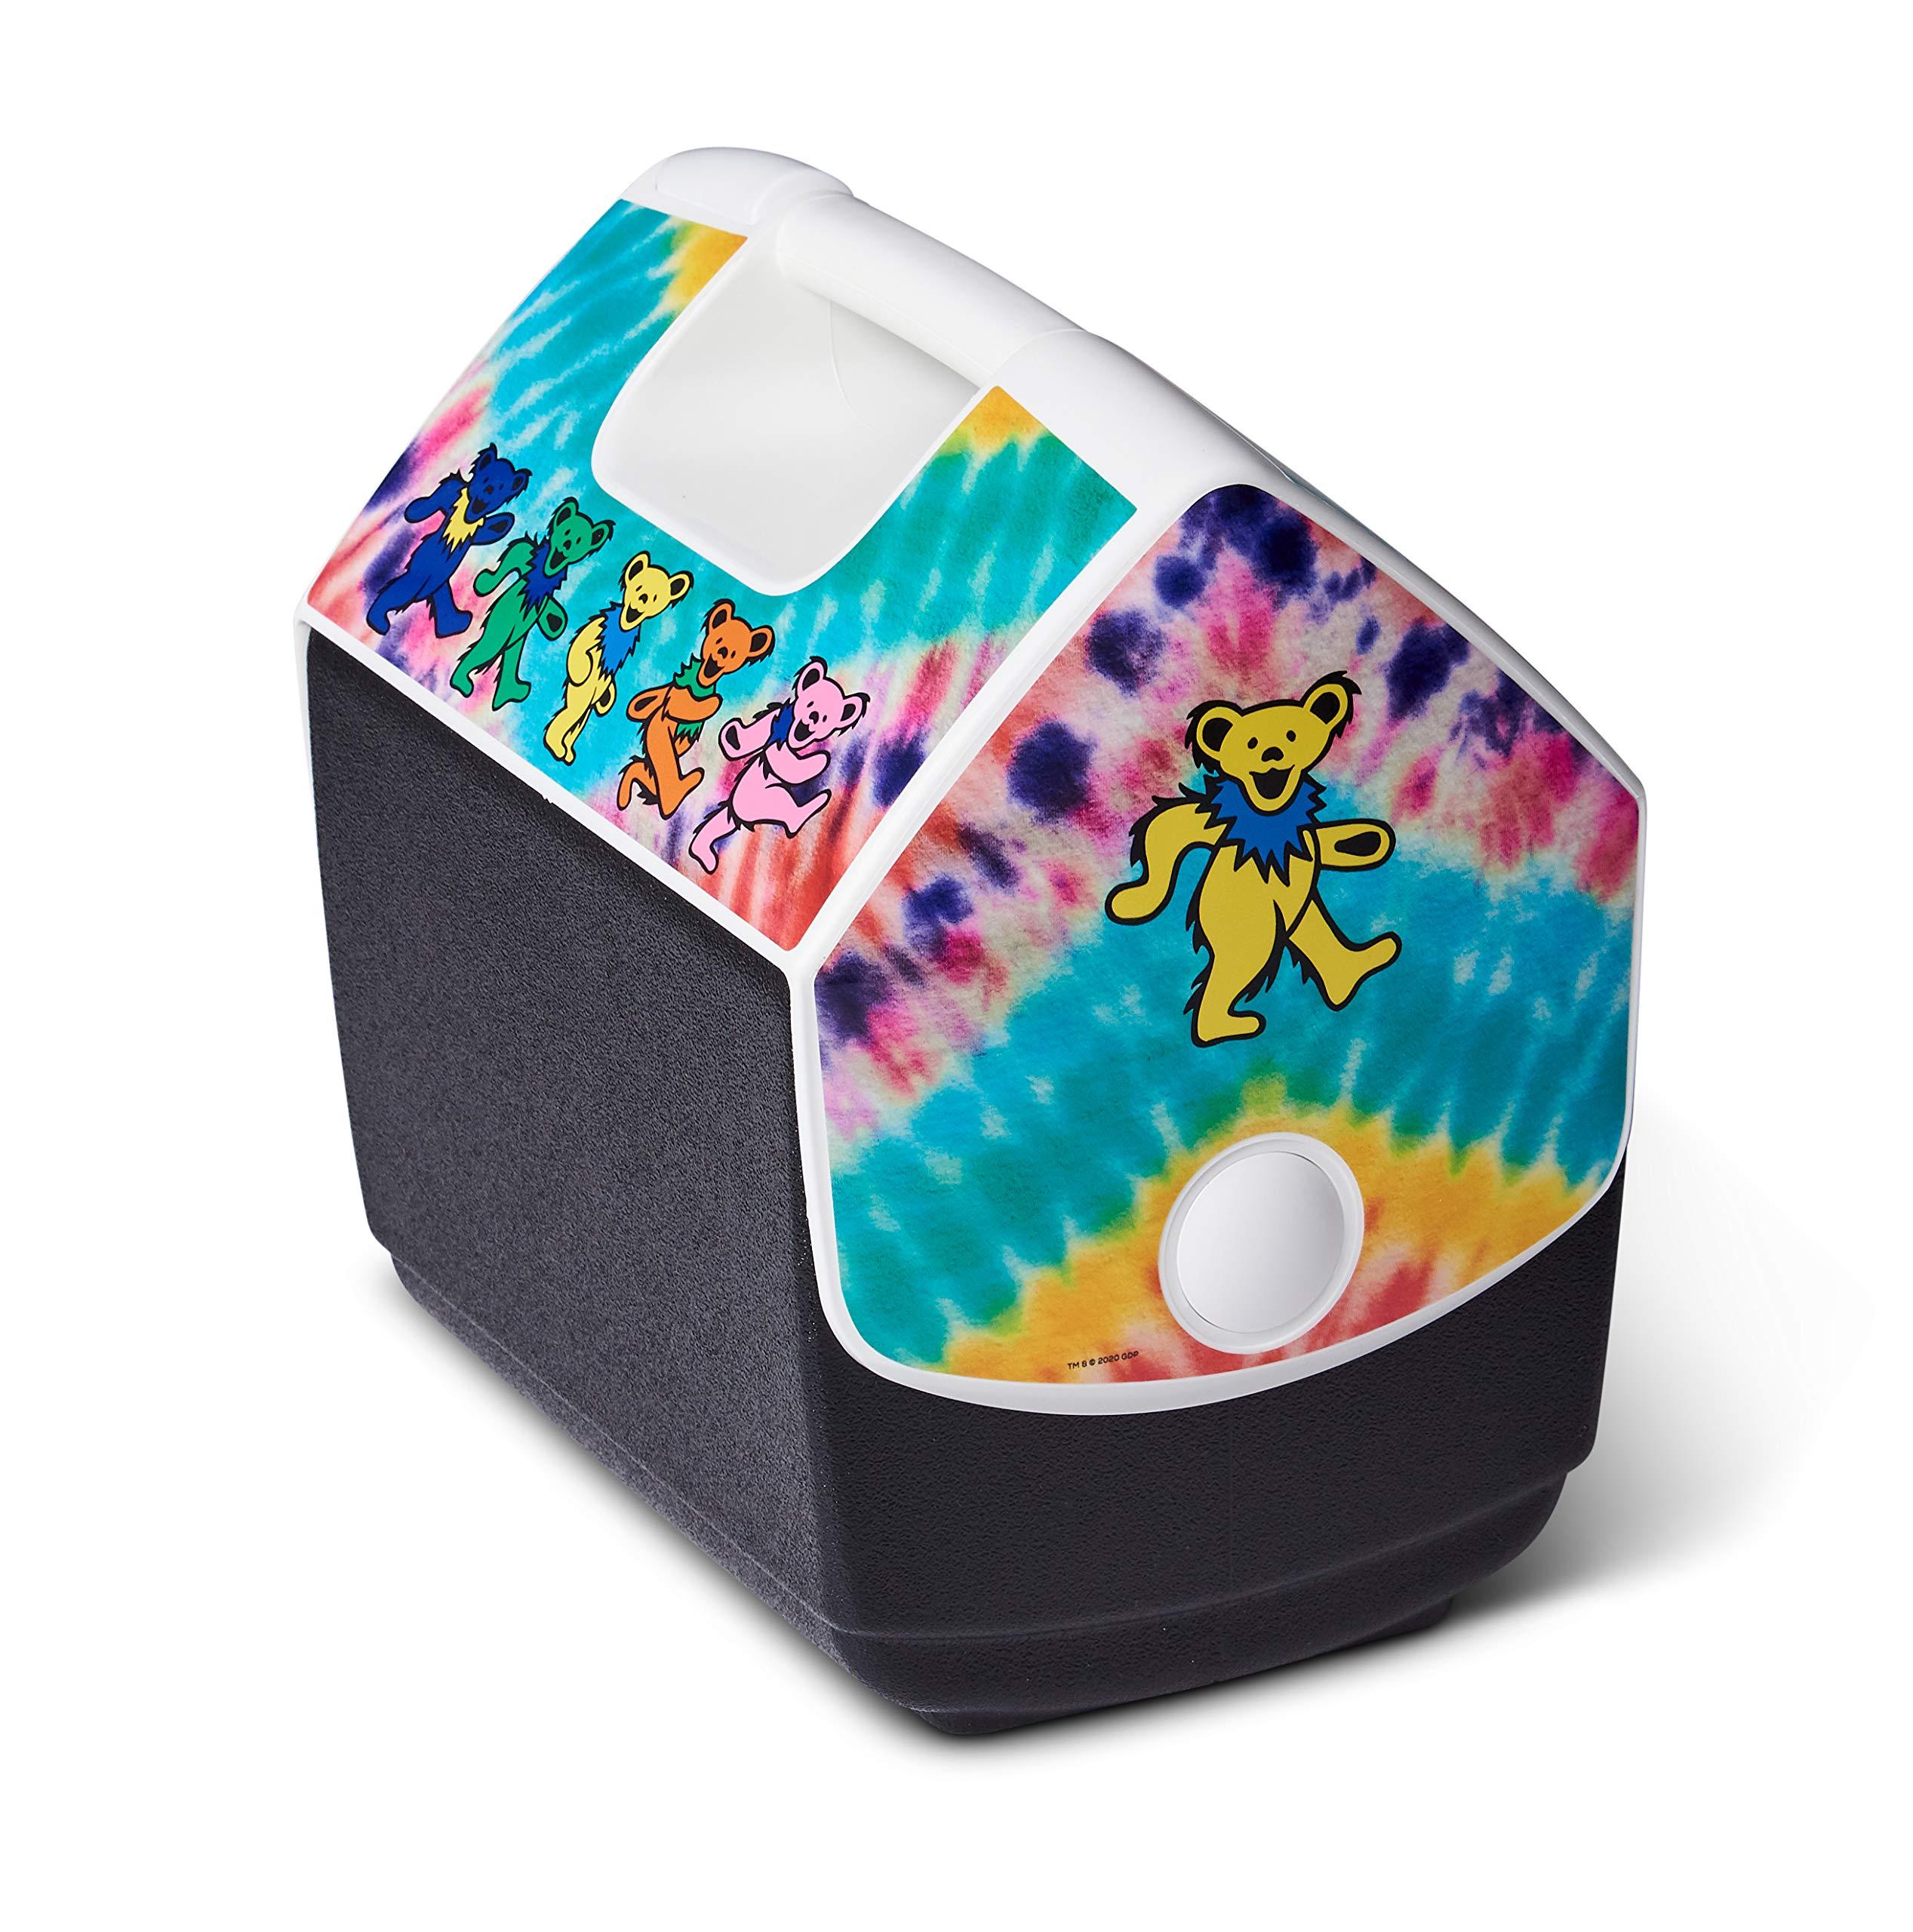 Igloo 7 Qt Limited Edition Playmate Series